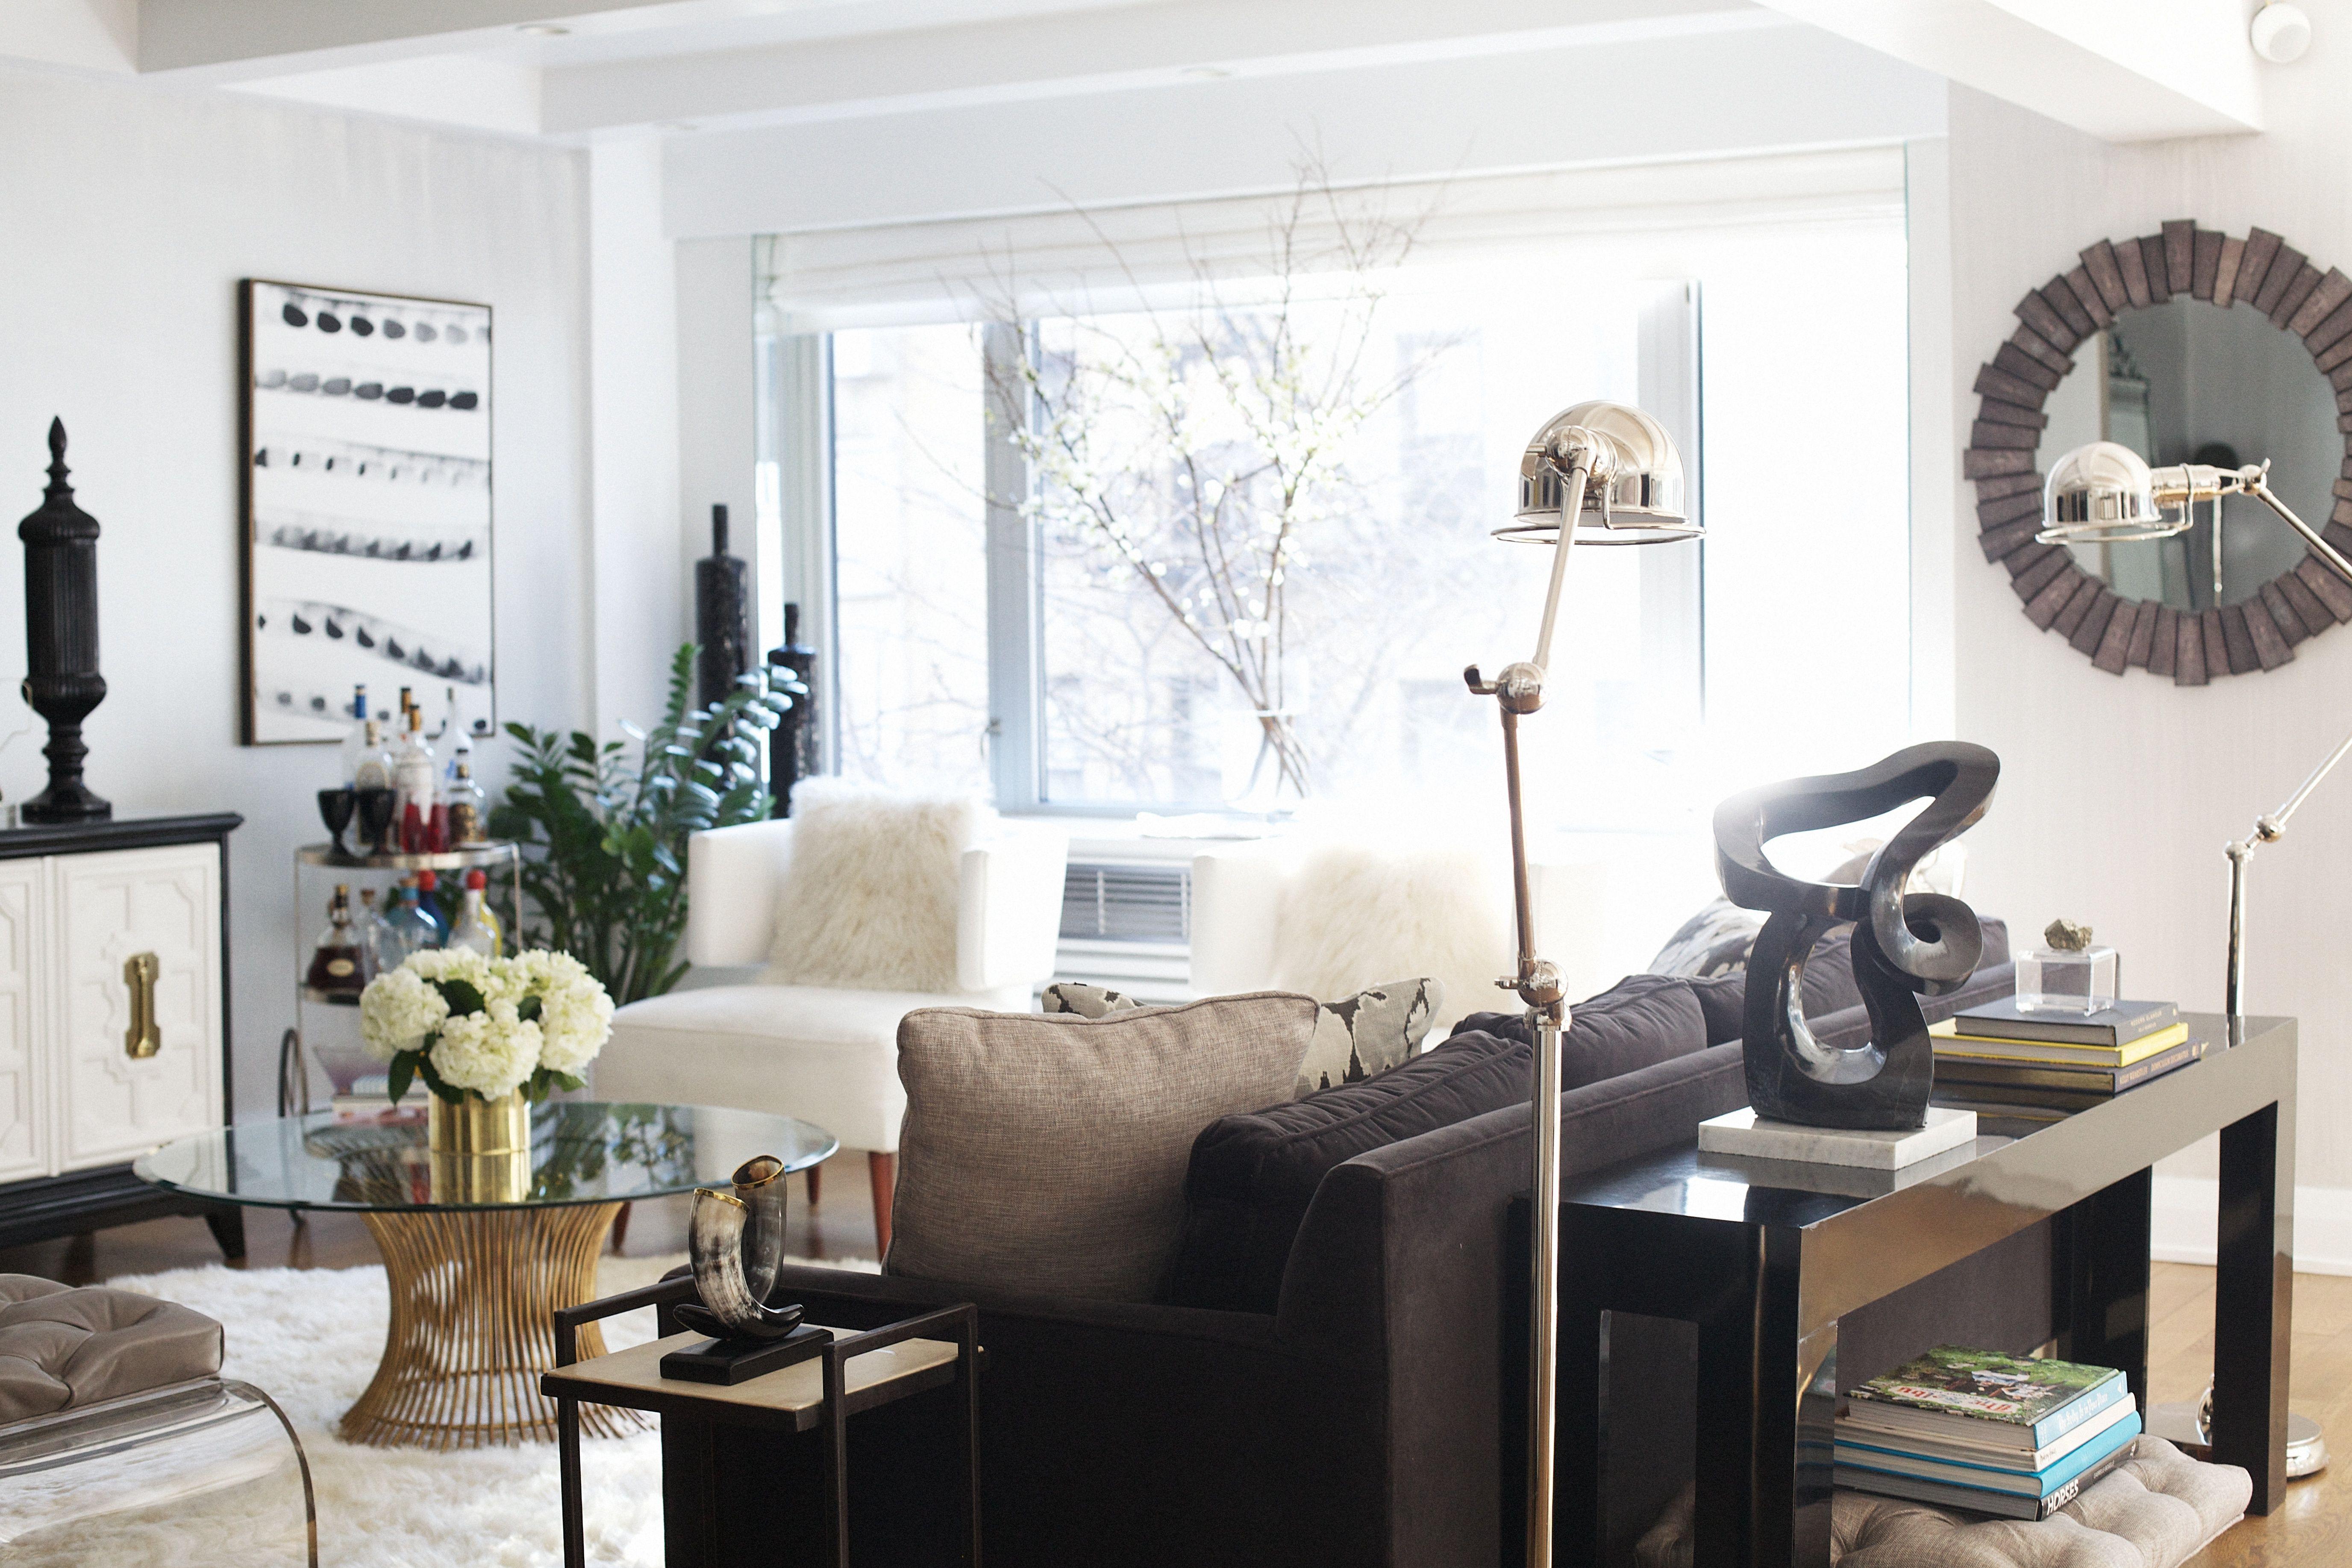 Nicole Cohenu0027s fabulous bw apartment featured on